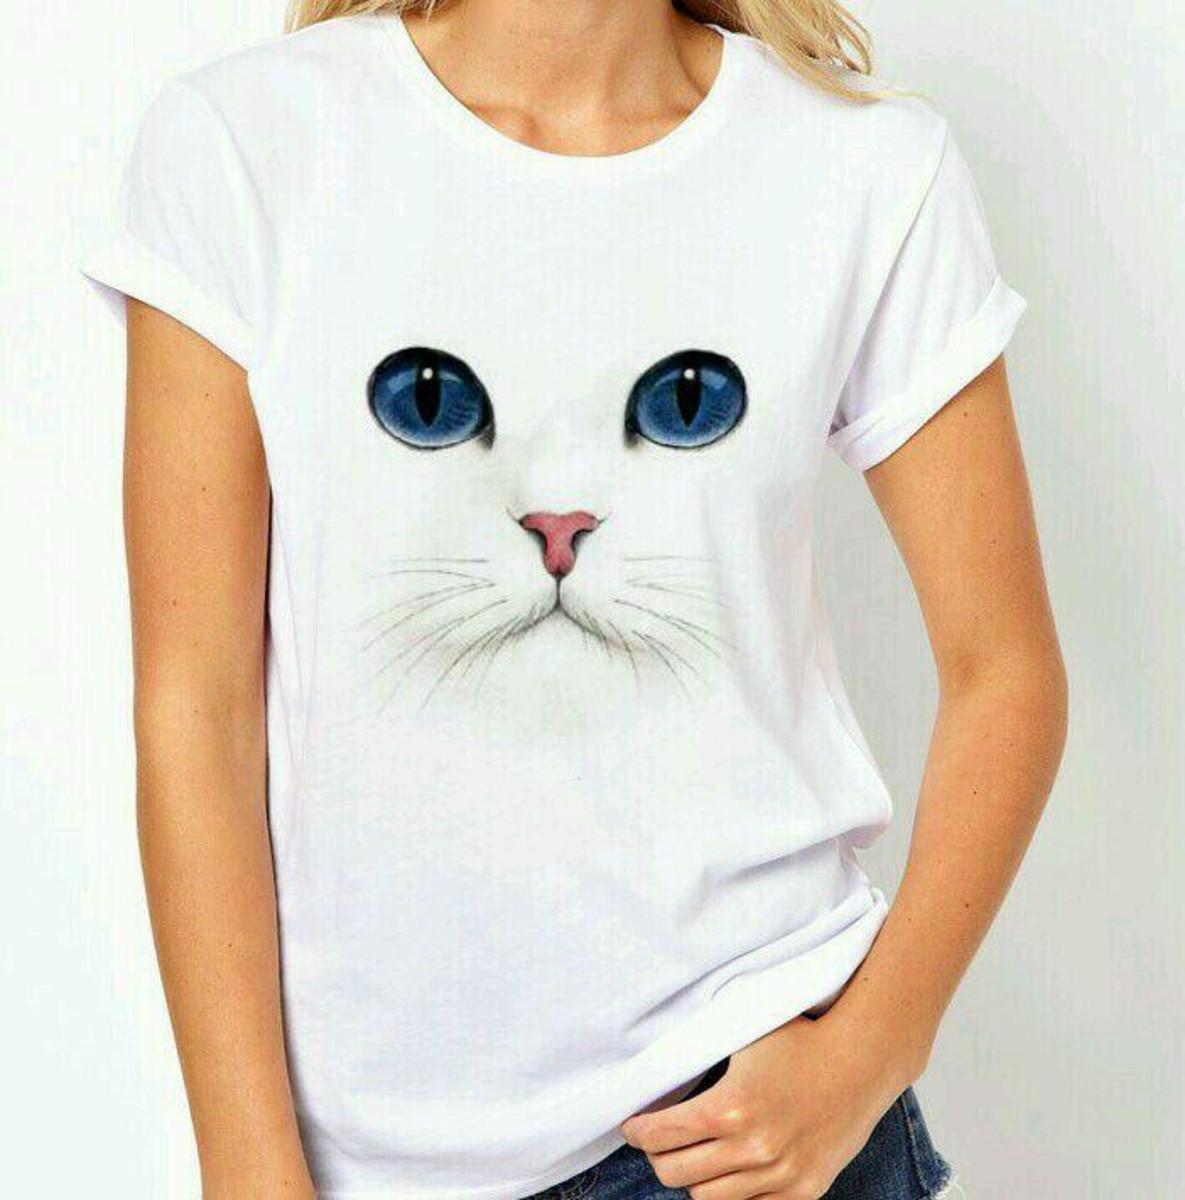 b28299e89f6 Camiseta feminina estilosa no Elo7